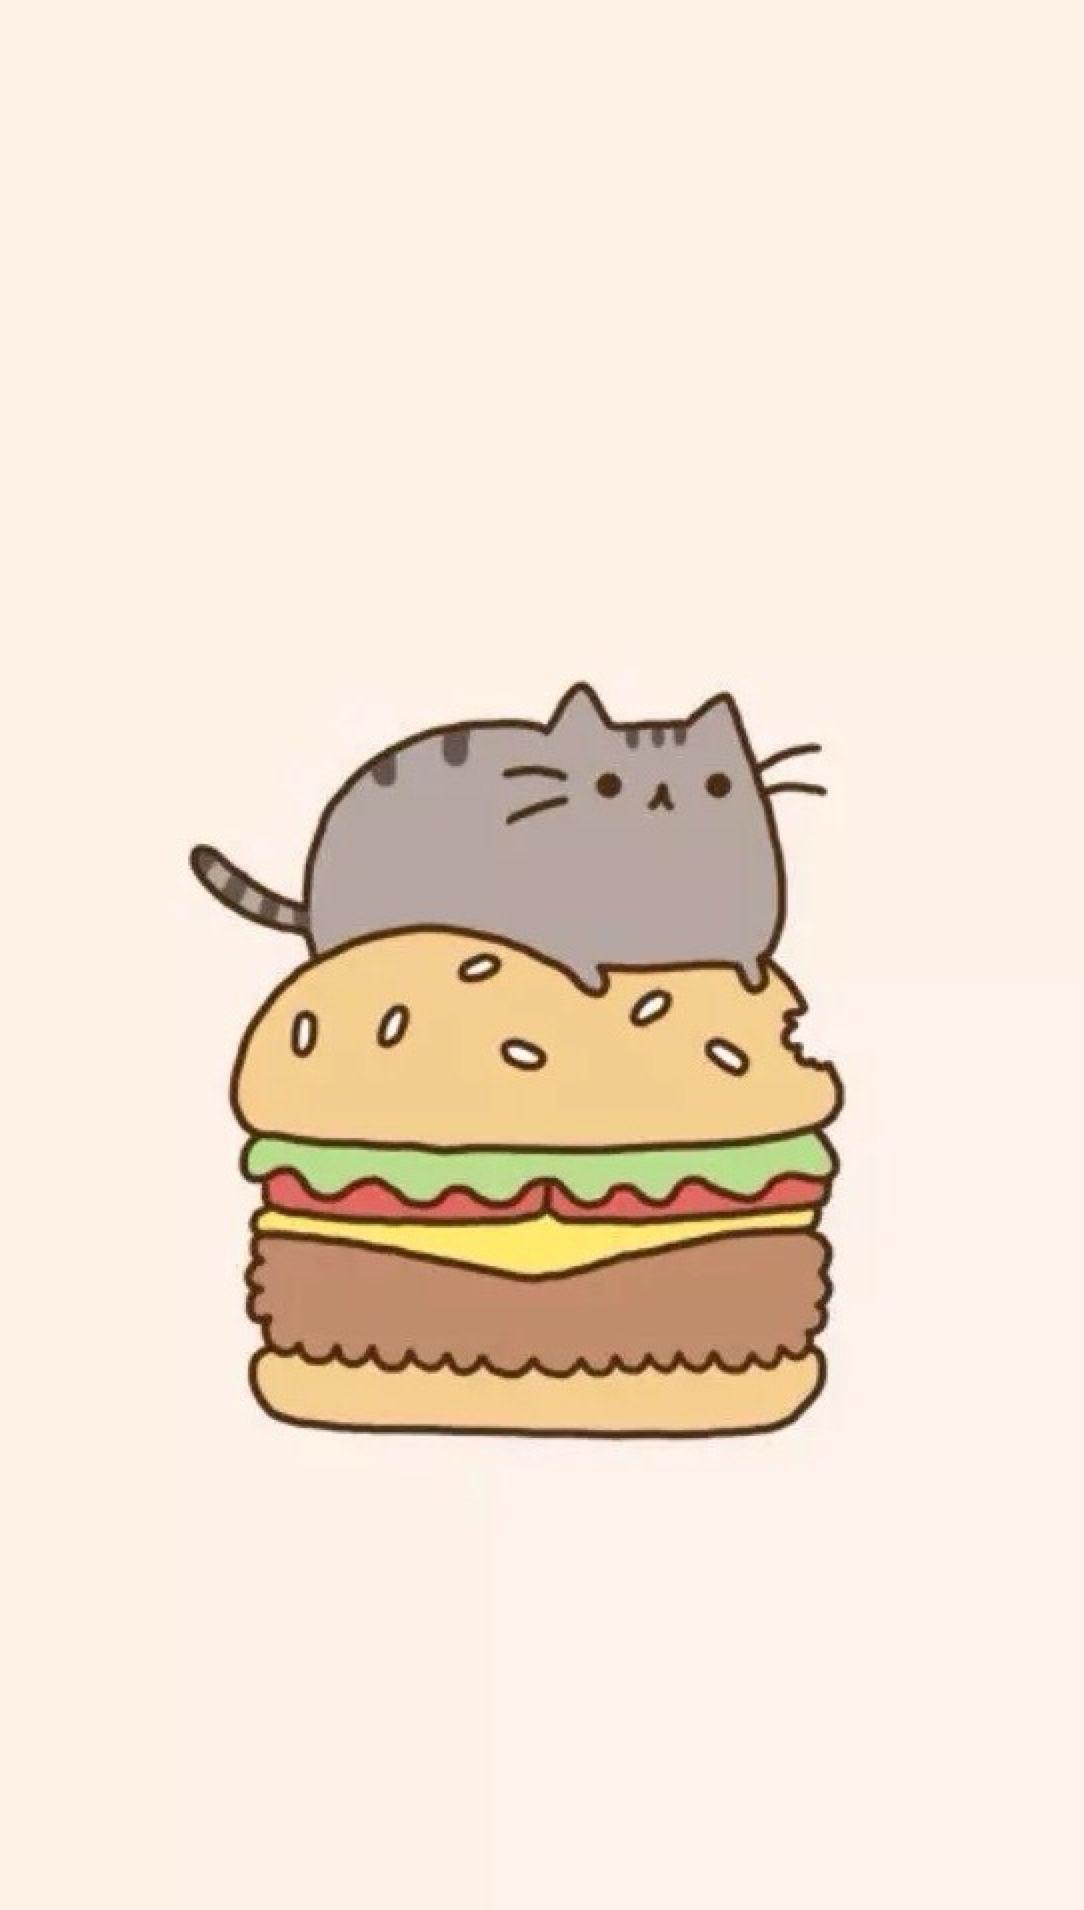 Pin by Kelsey Kerzman on Phone Wallpapers. Pusheen cat